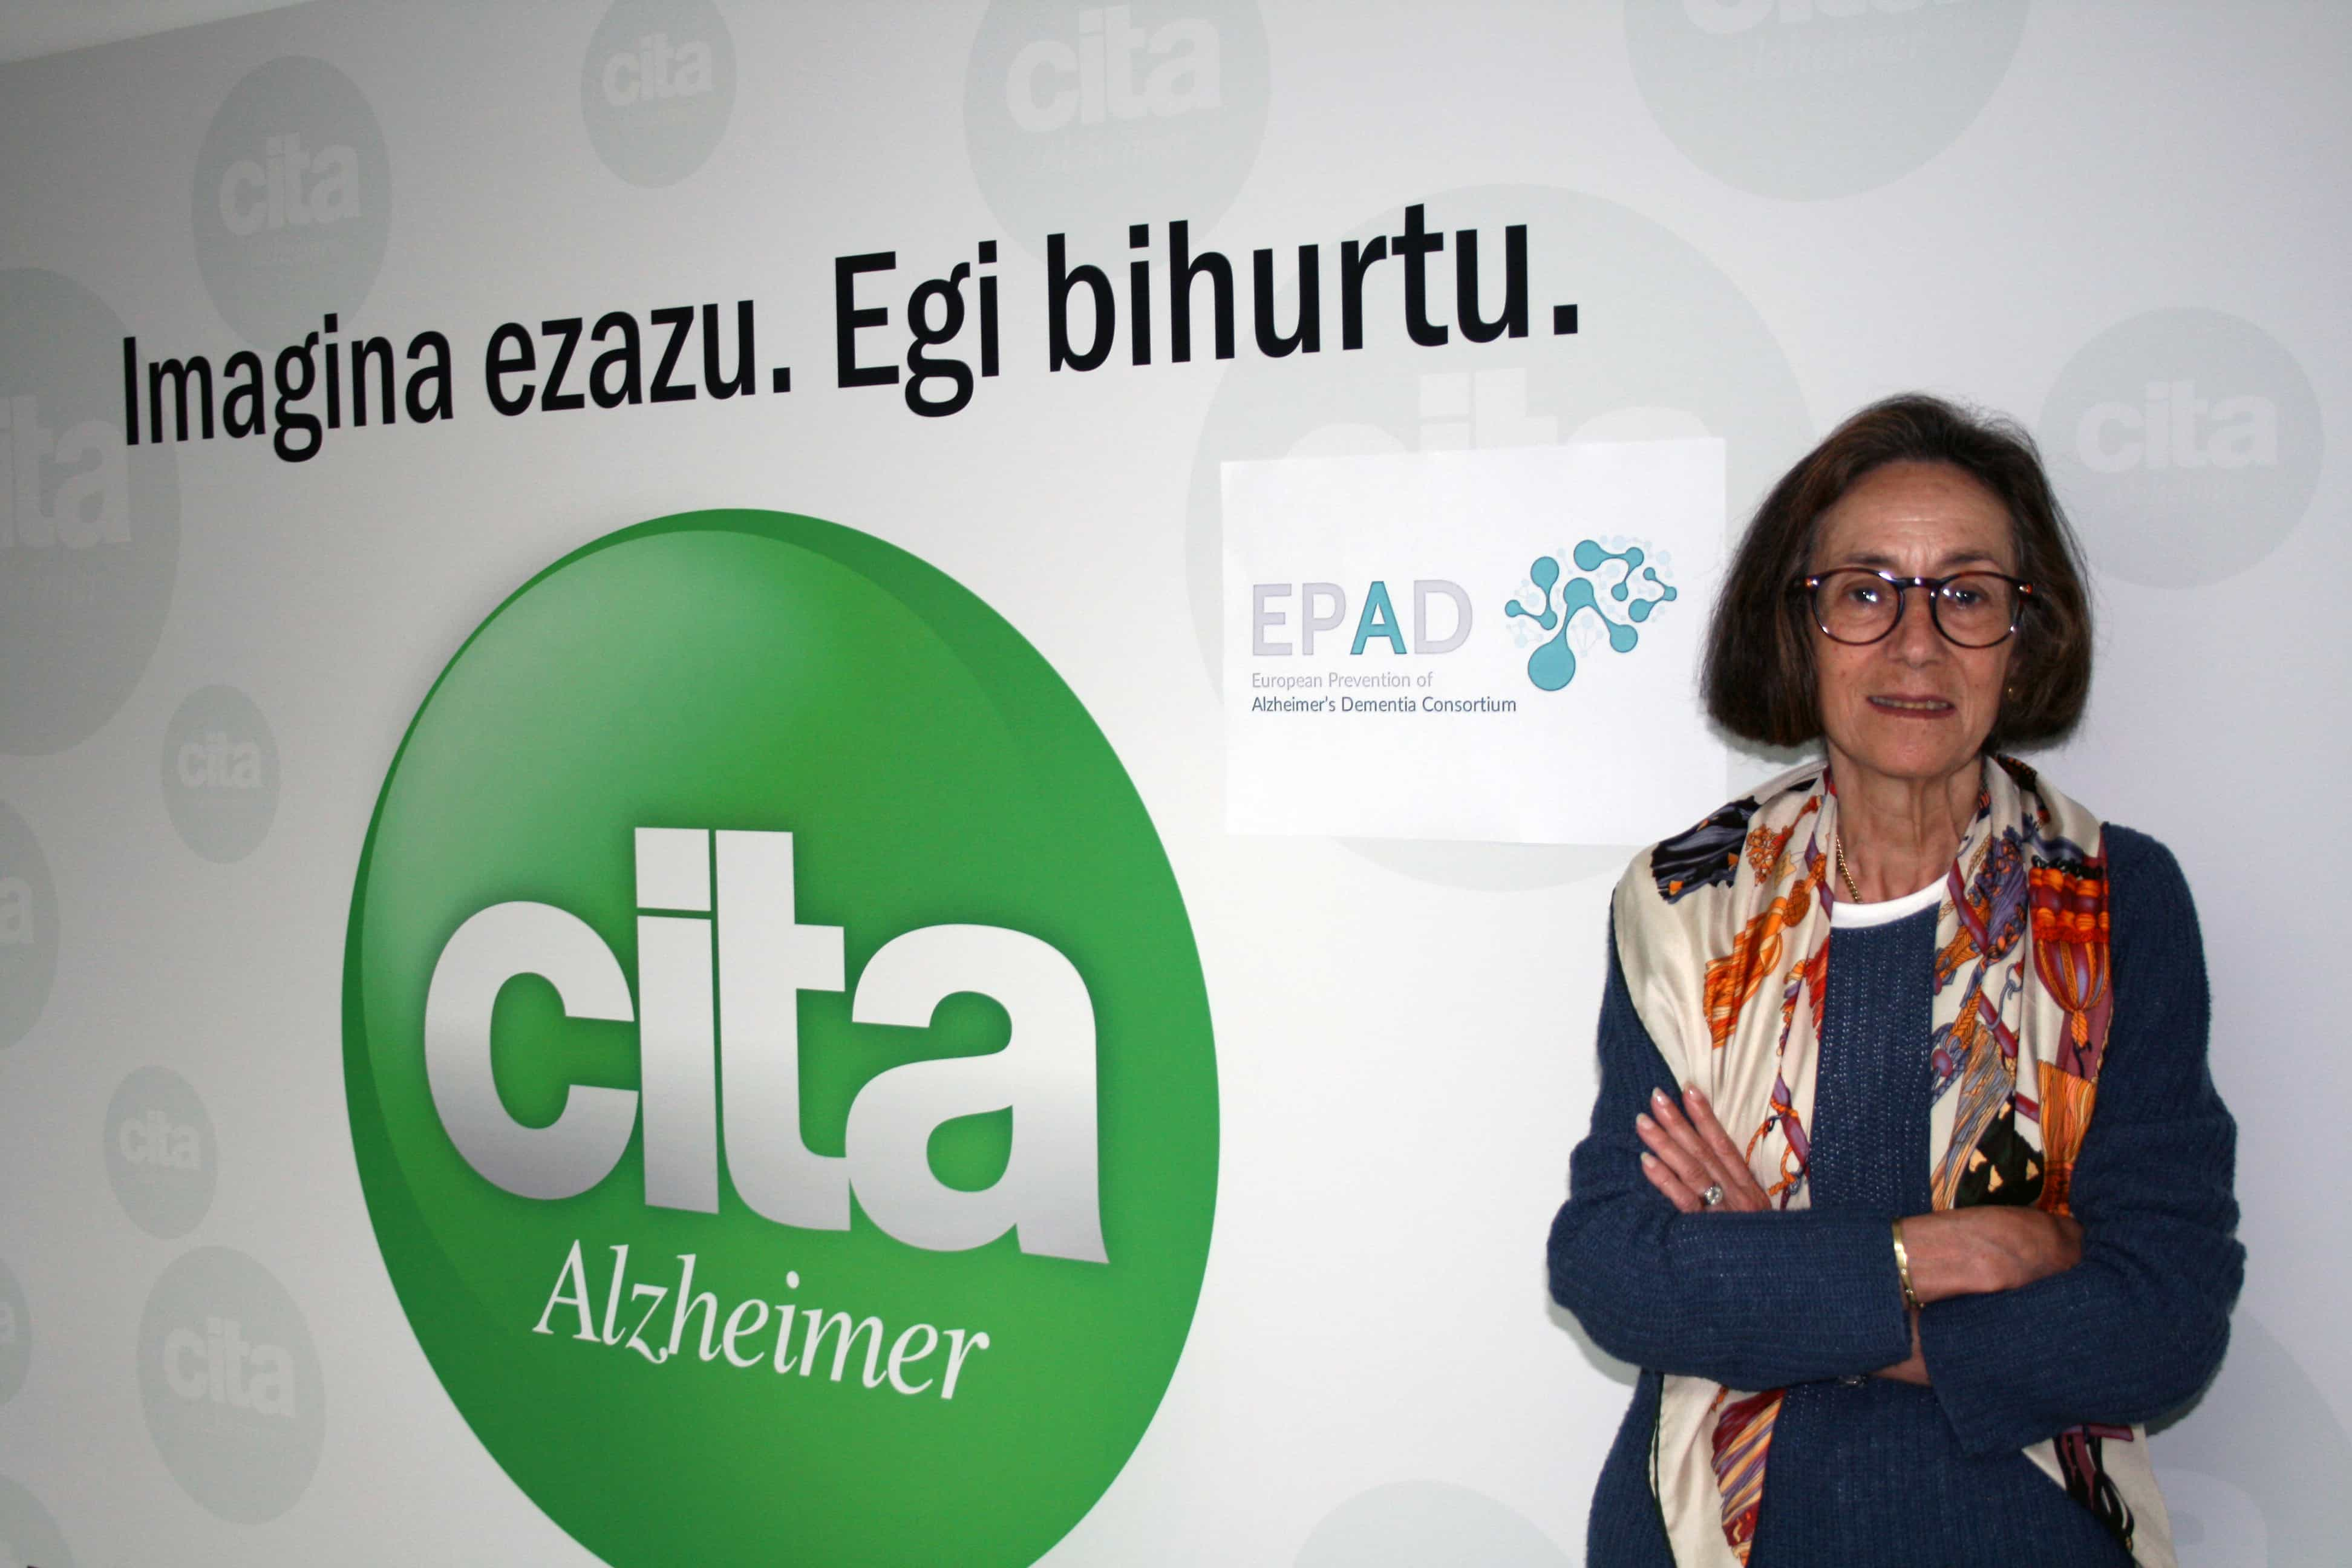 CITA first participant in EPAD